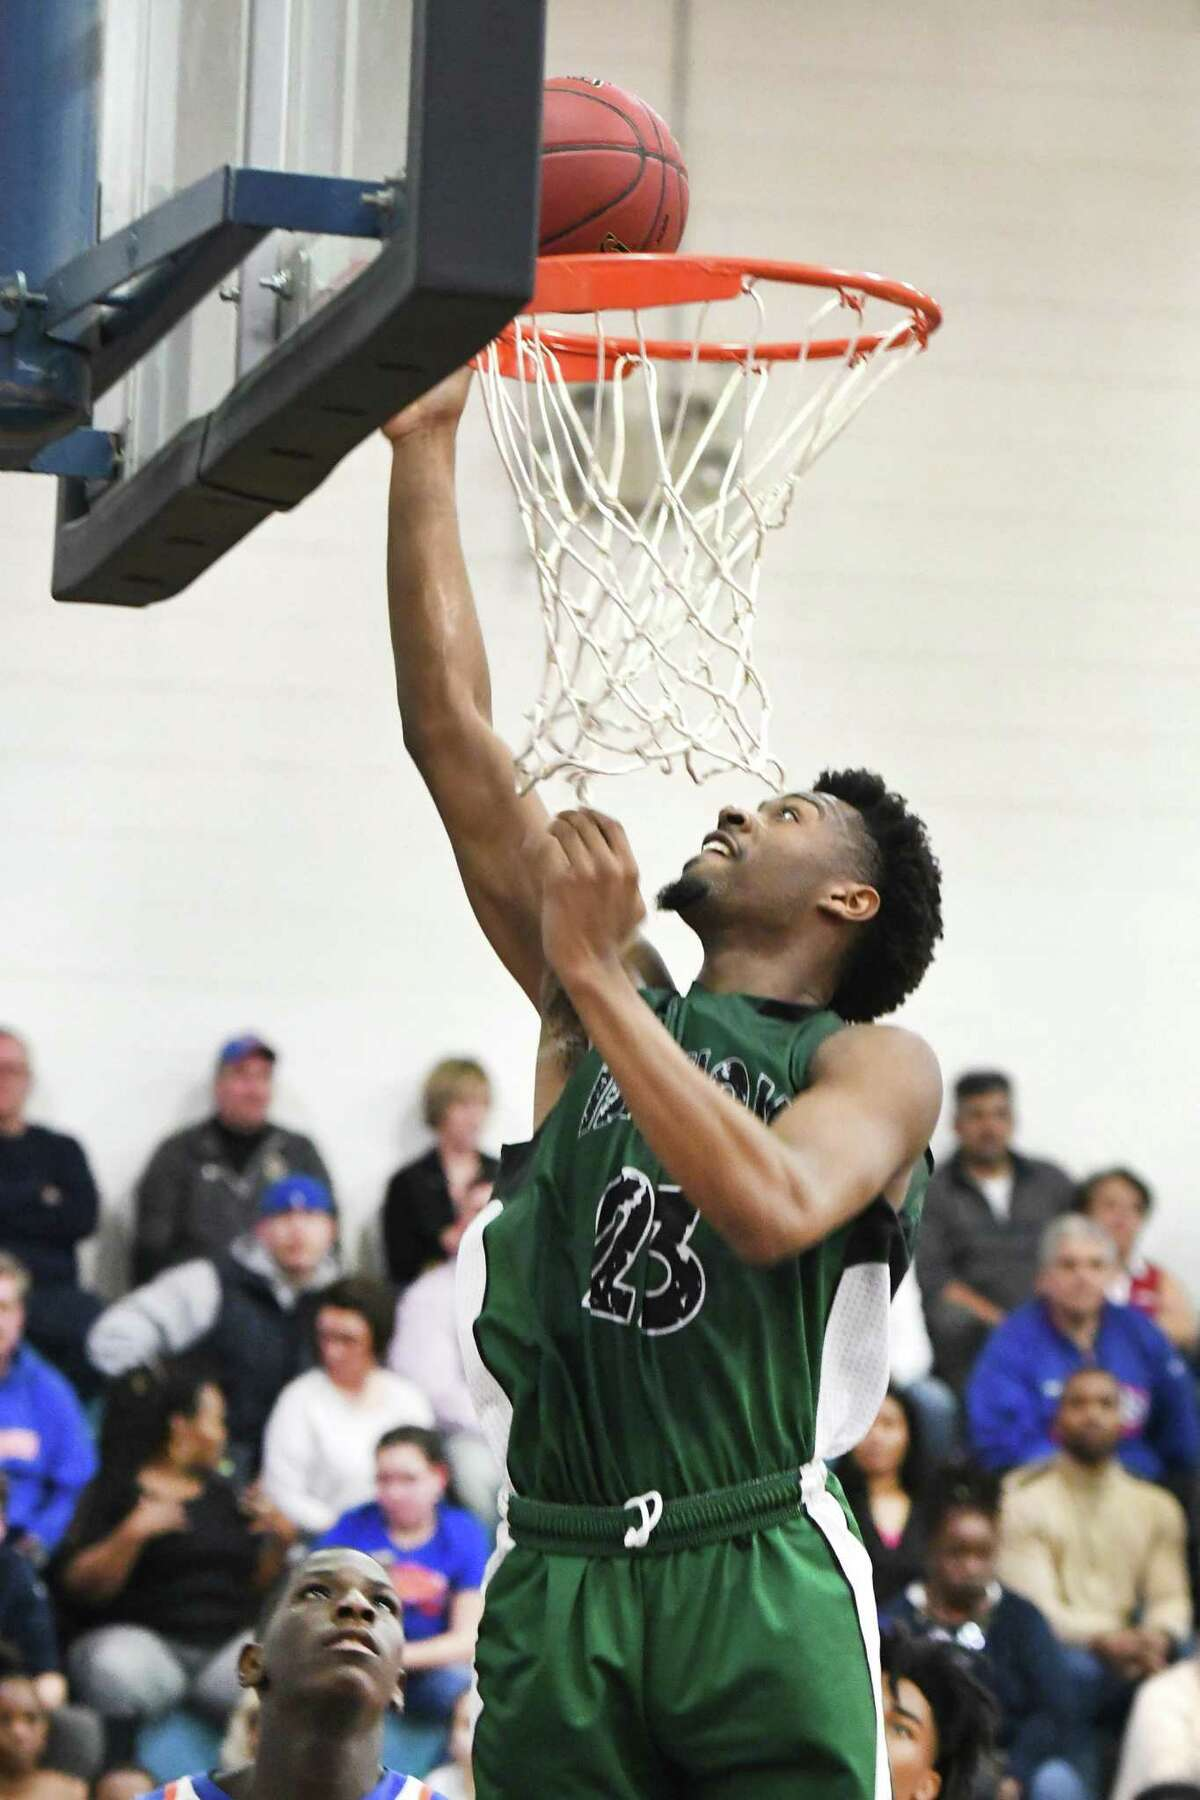 Bassick's Jordan Gallimore makes a basket during a game against Danbury earlier this season.